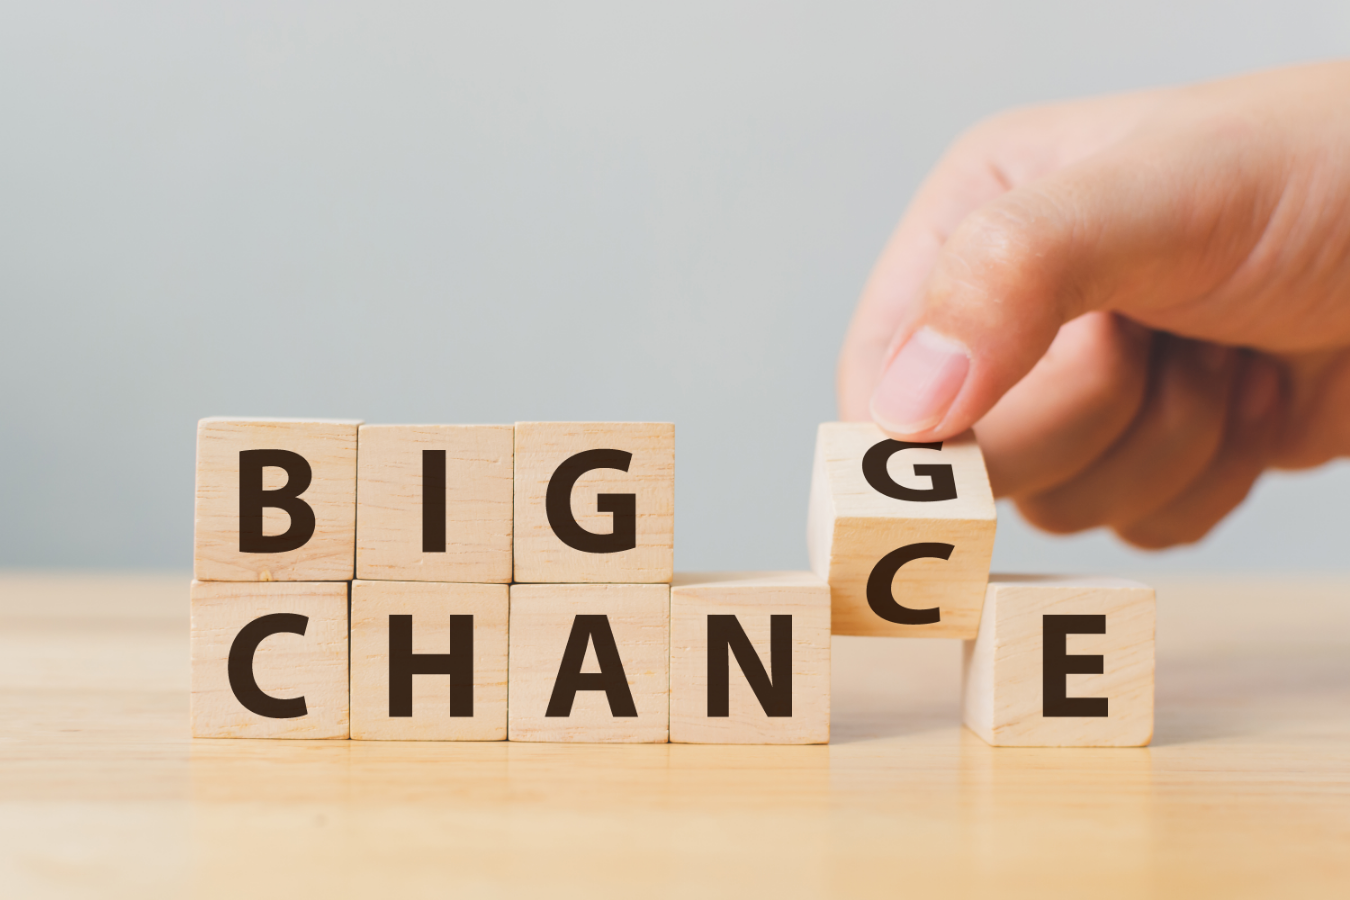 bigchange=chance